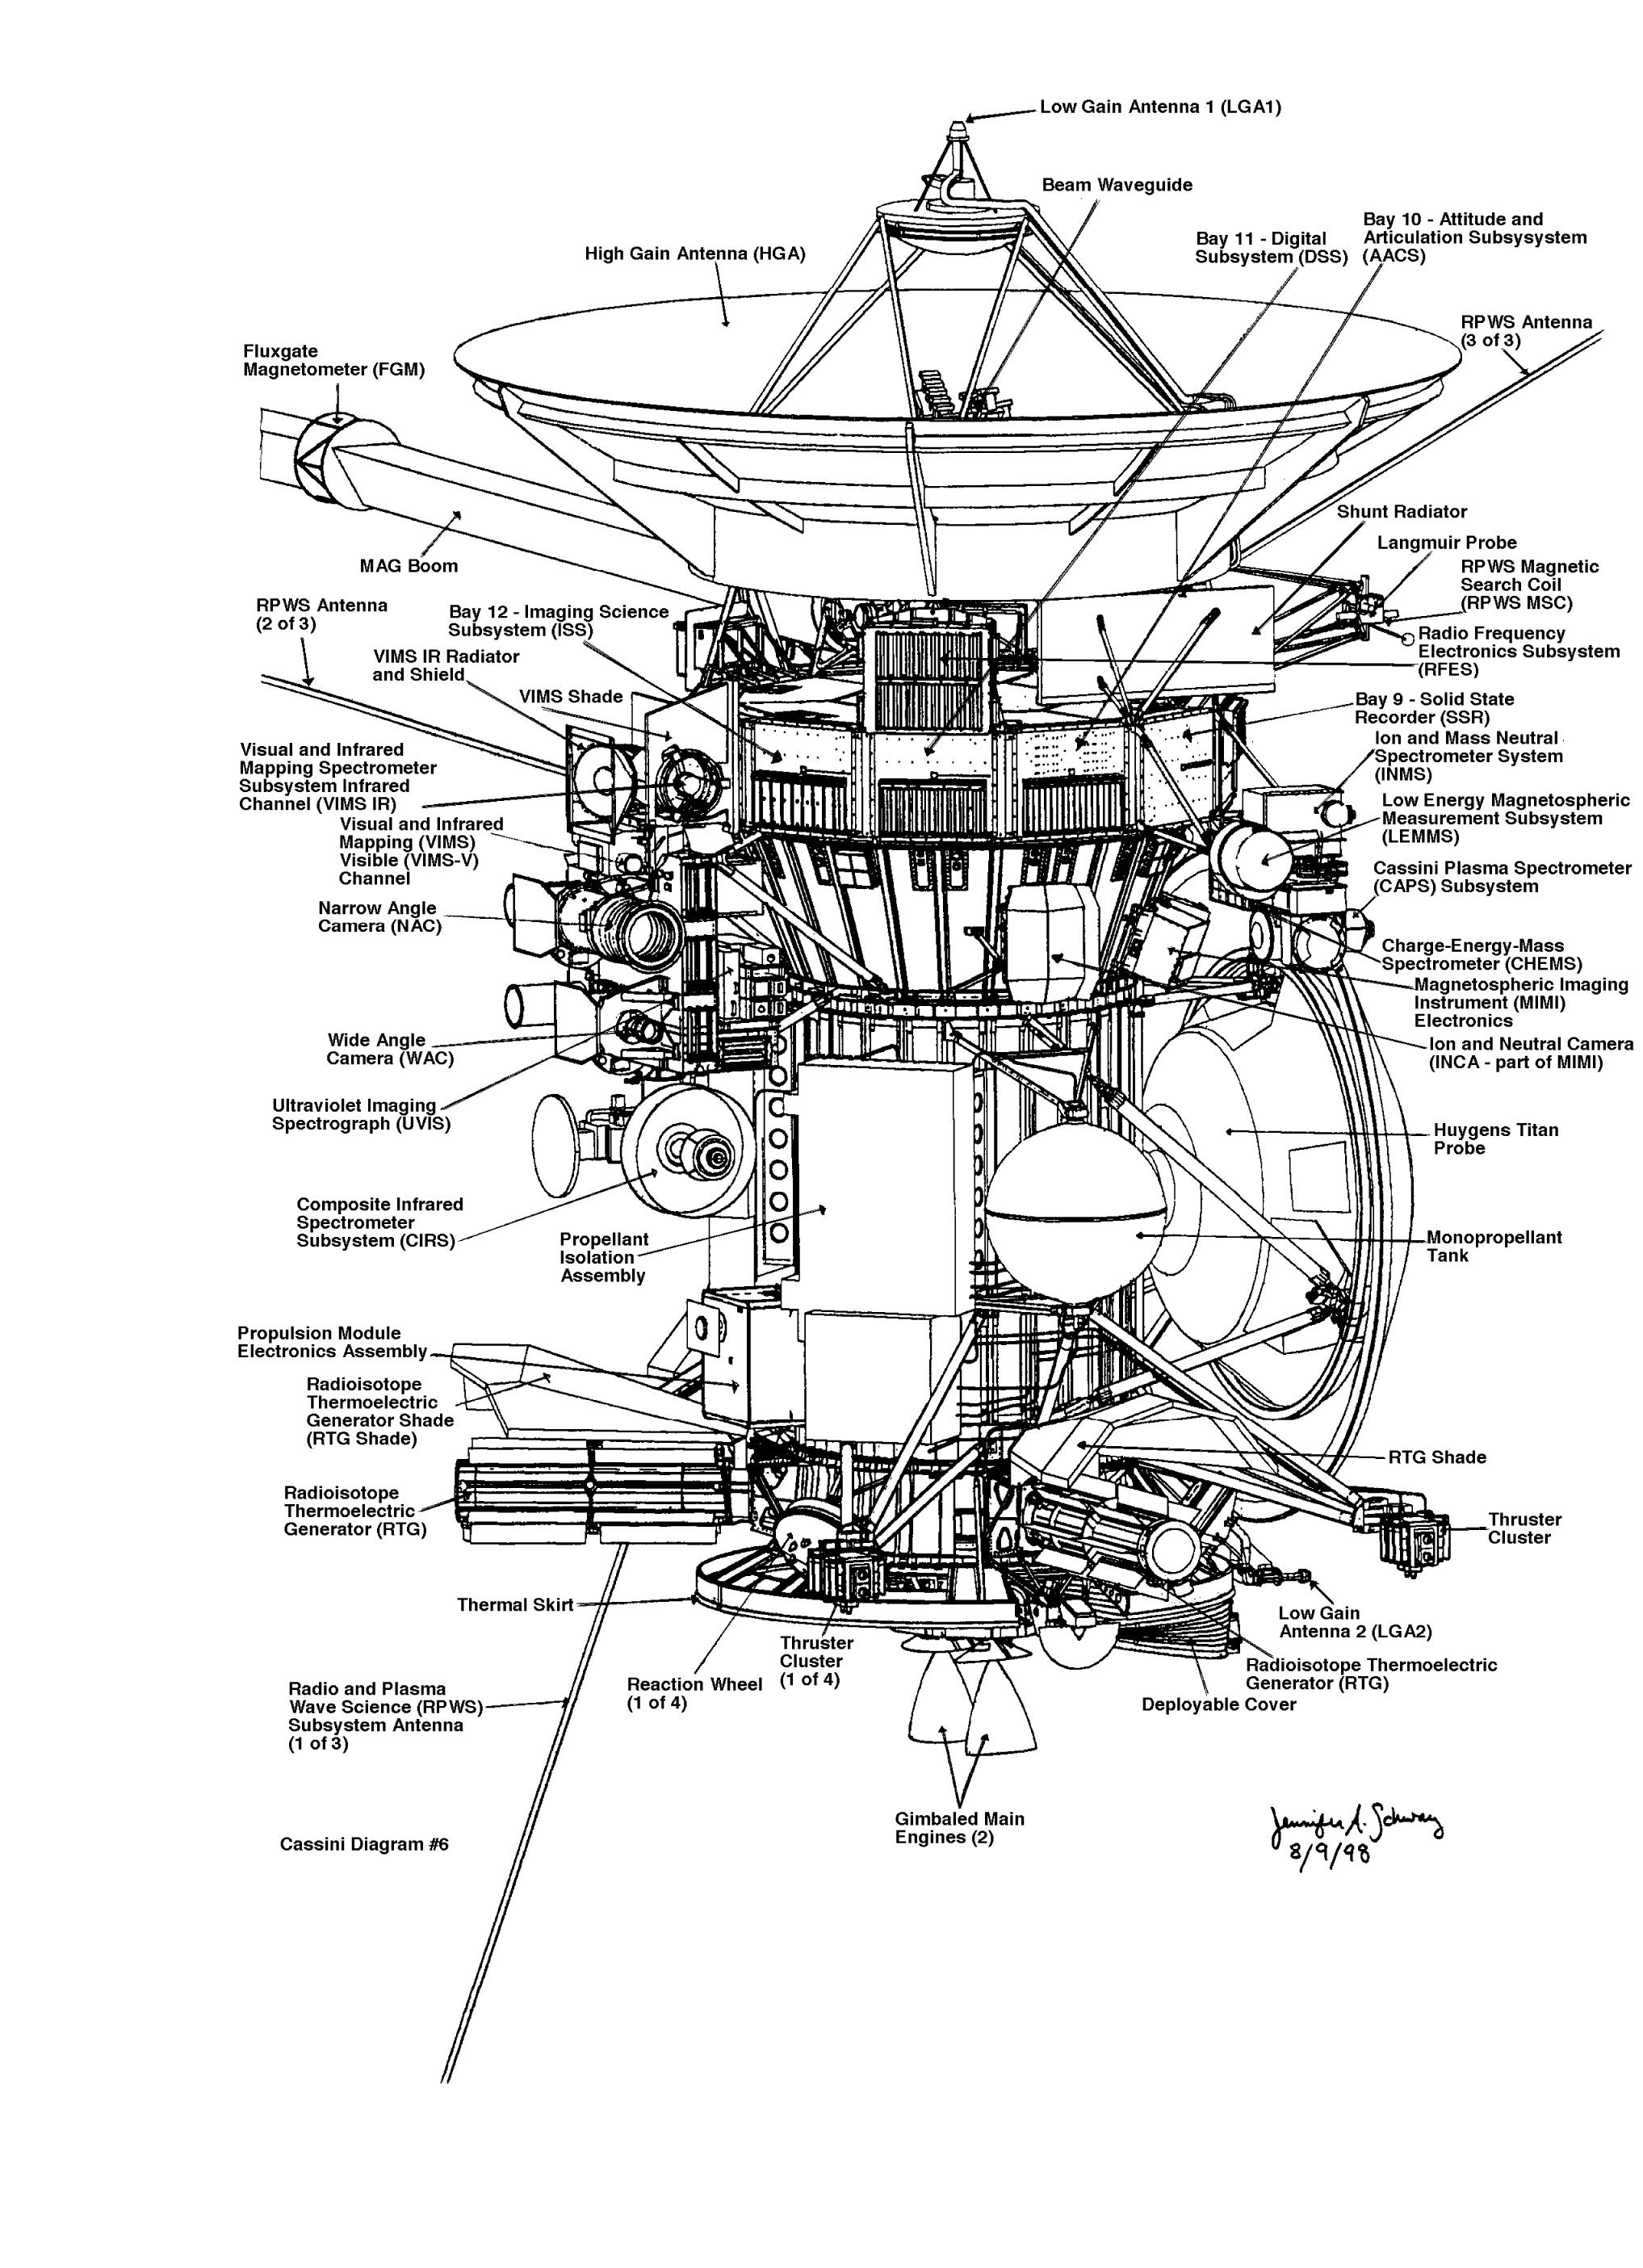 Cassini Diagram No. 6 | Solar System Exploration: NASA Science